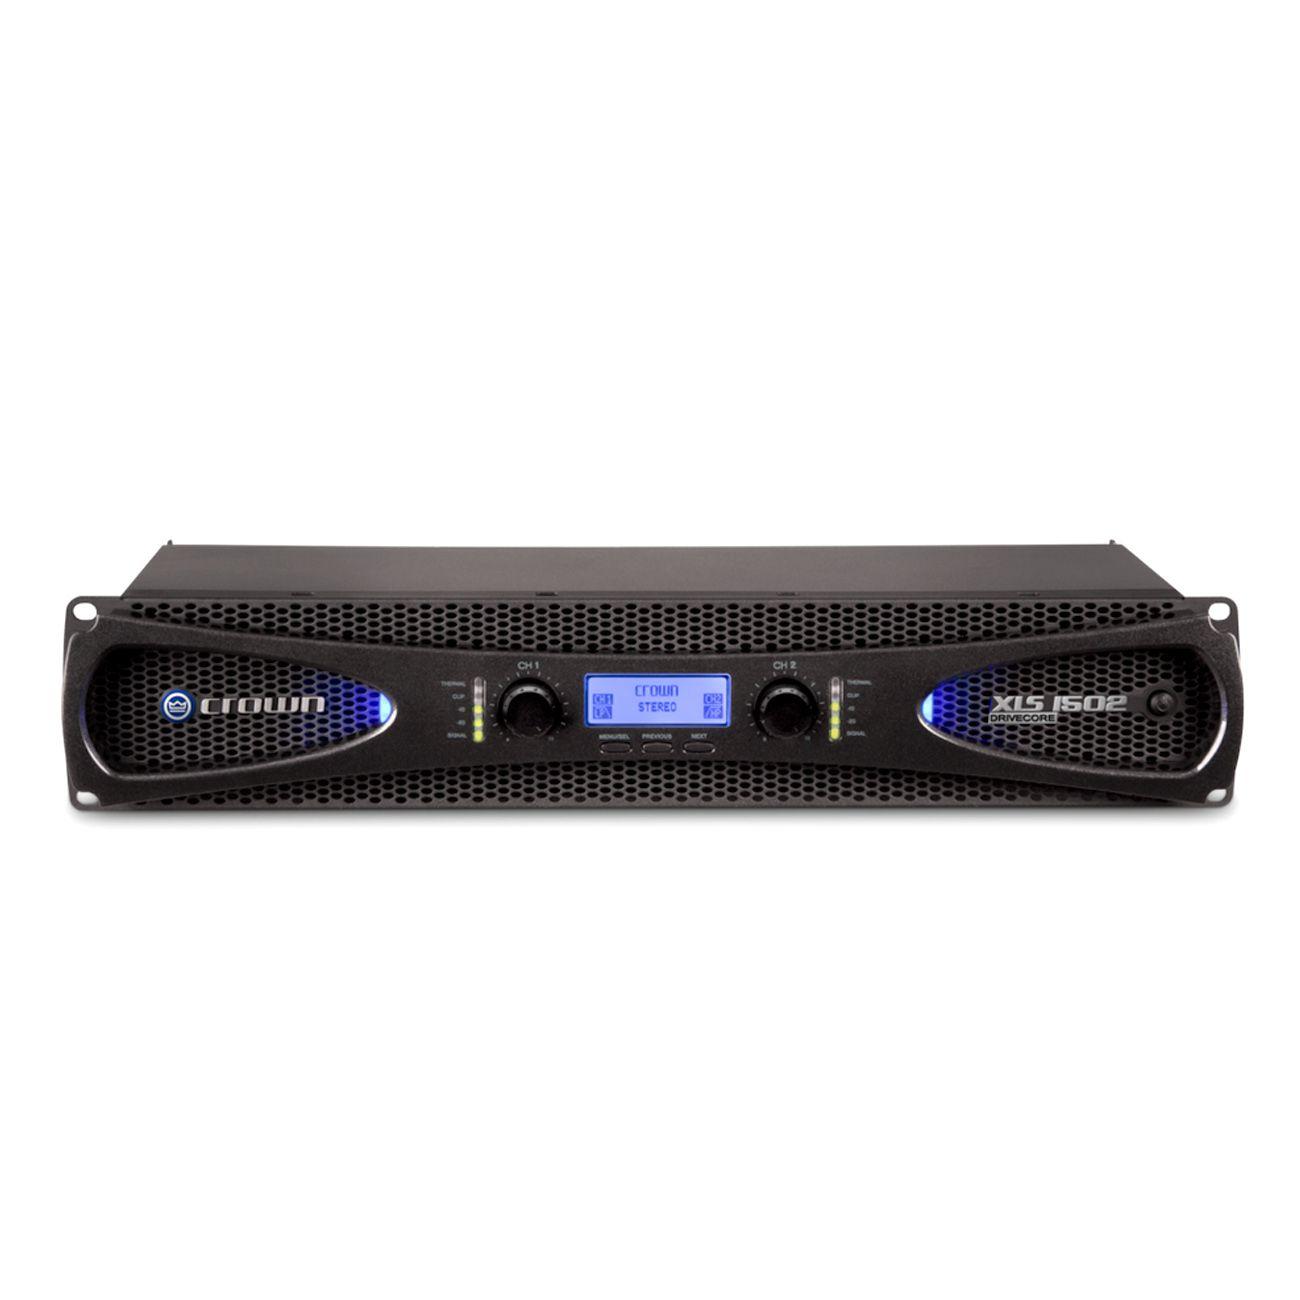 Amplificador Potência Crown Xls1502 1050w 8 Ohms 220v